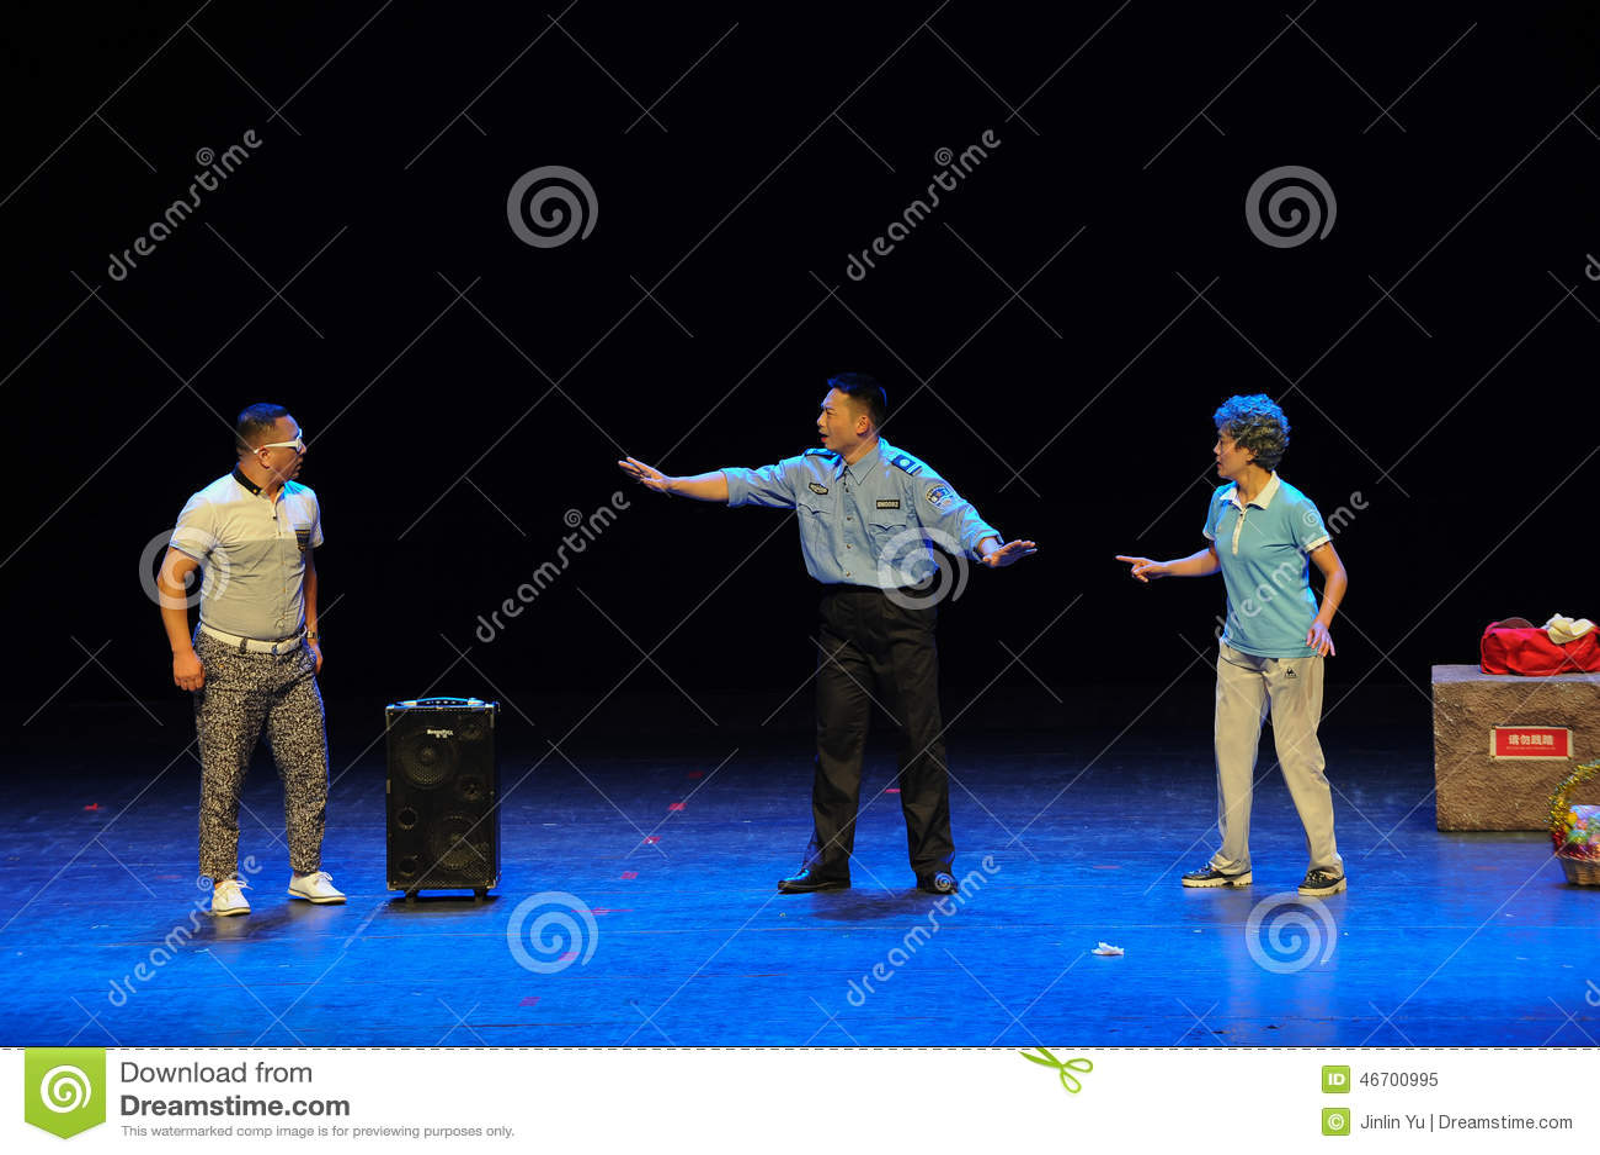 Listen Dissuade Sketch Jump Square Dance Aunt Common People Big Stage November Public Performances